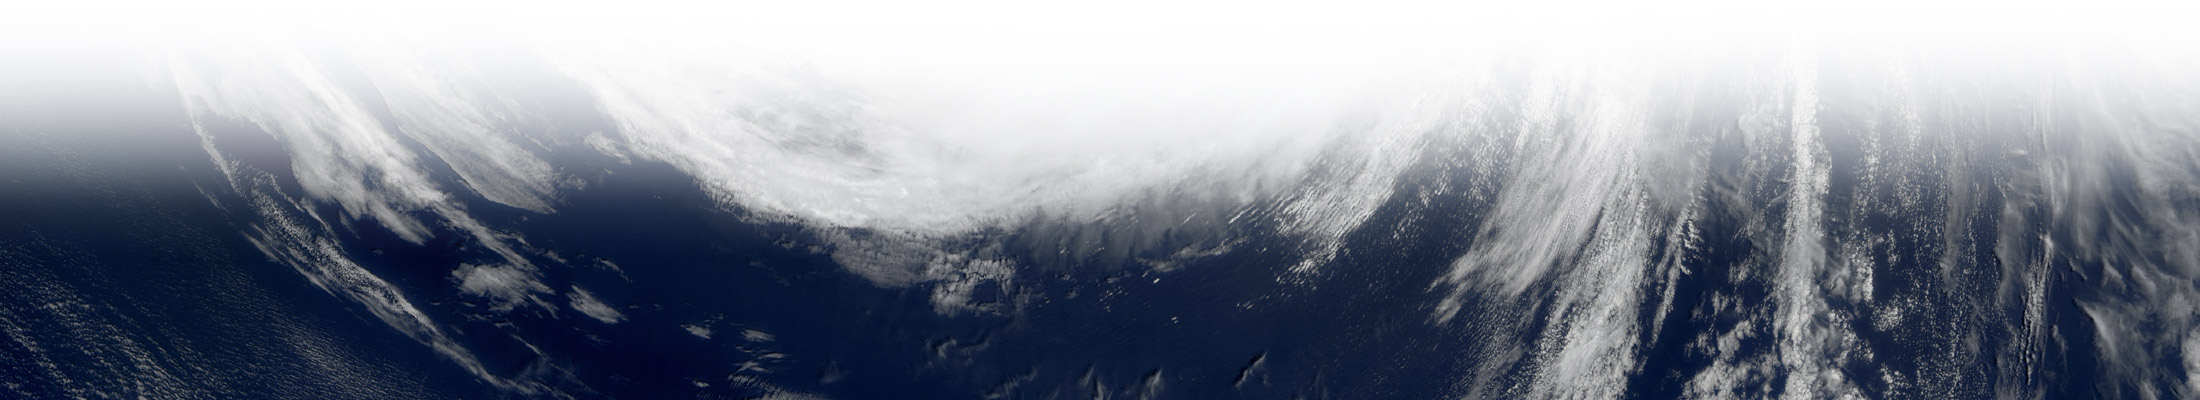 bg-hurricane-physics-top